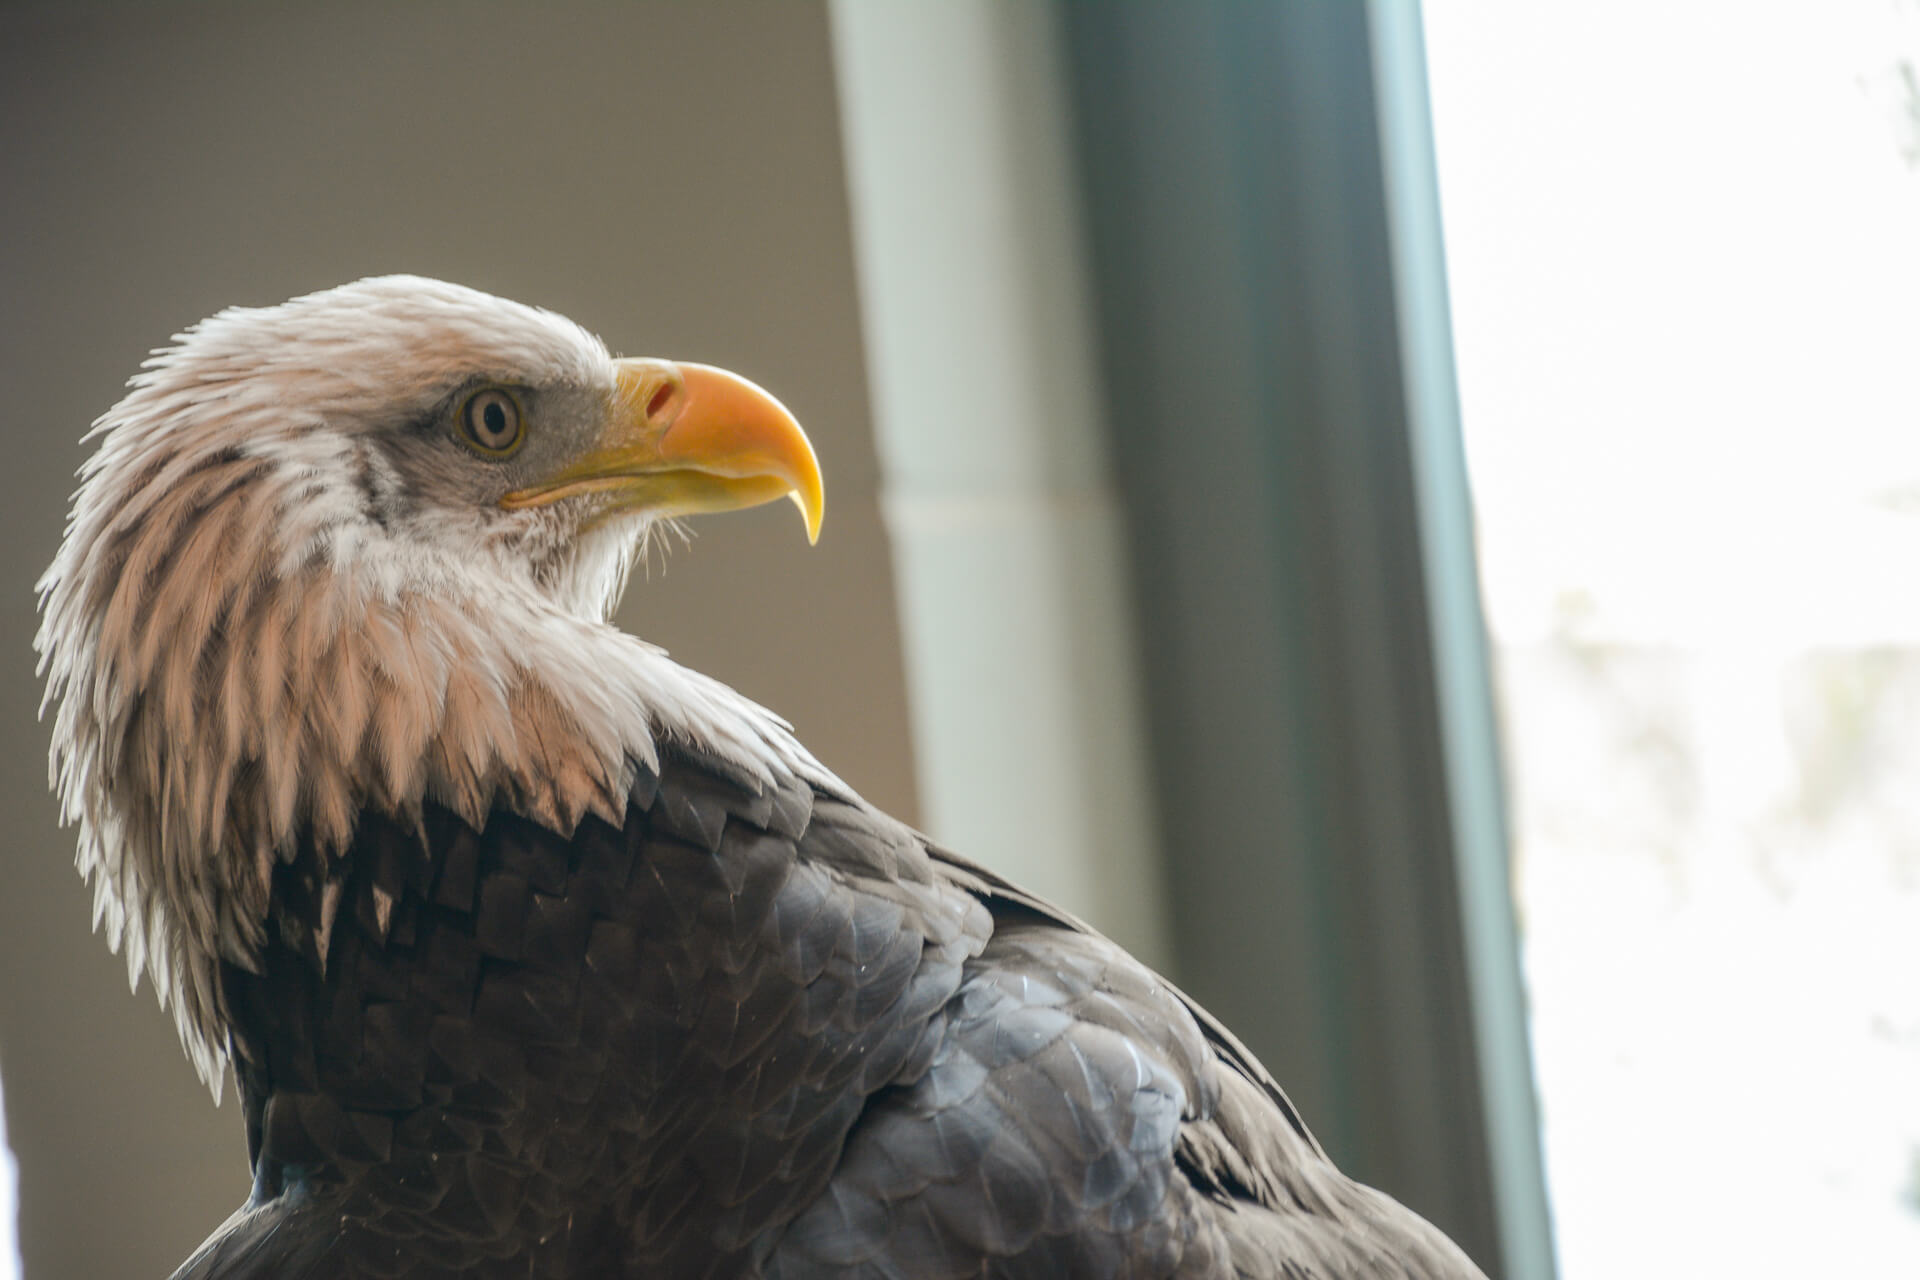 Bald eagle at National Eagle Center, Wabasha Minnesota